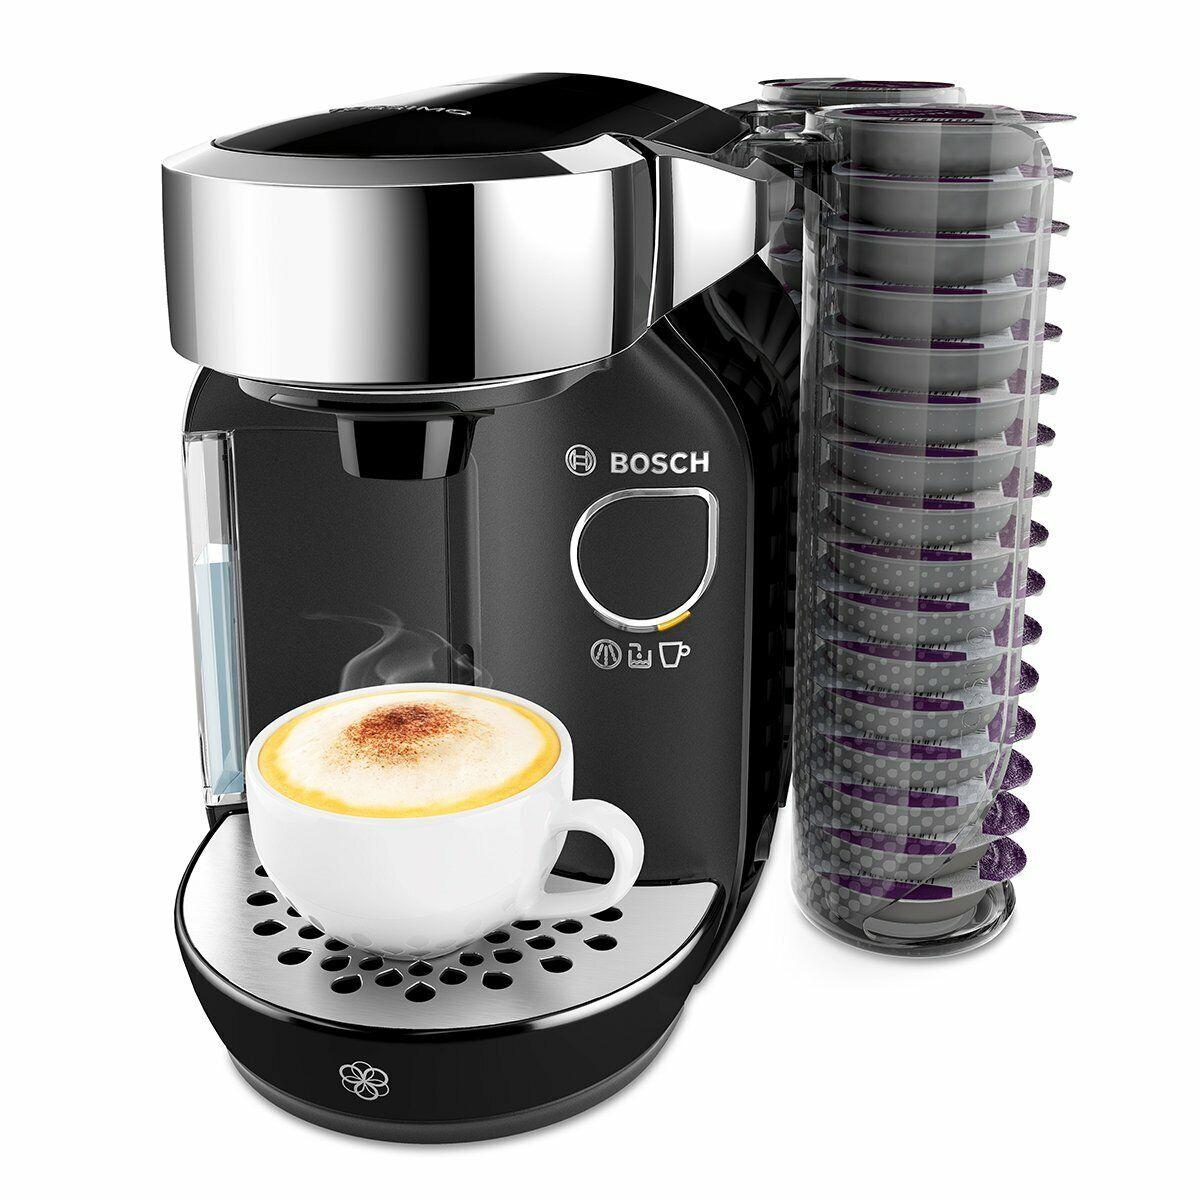 Bosch TAS7002 Independiente 1.2L noir - Cafetera Cápsula de café, noir 1300W